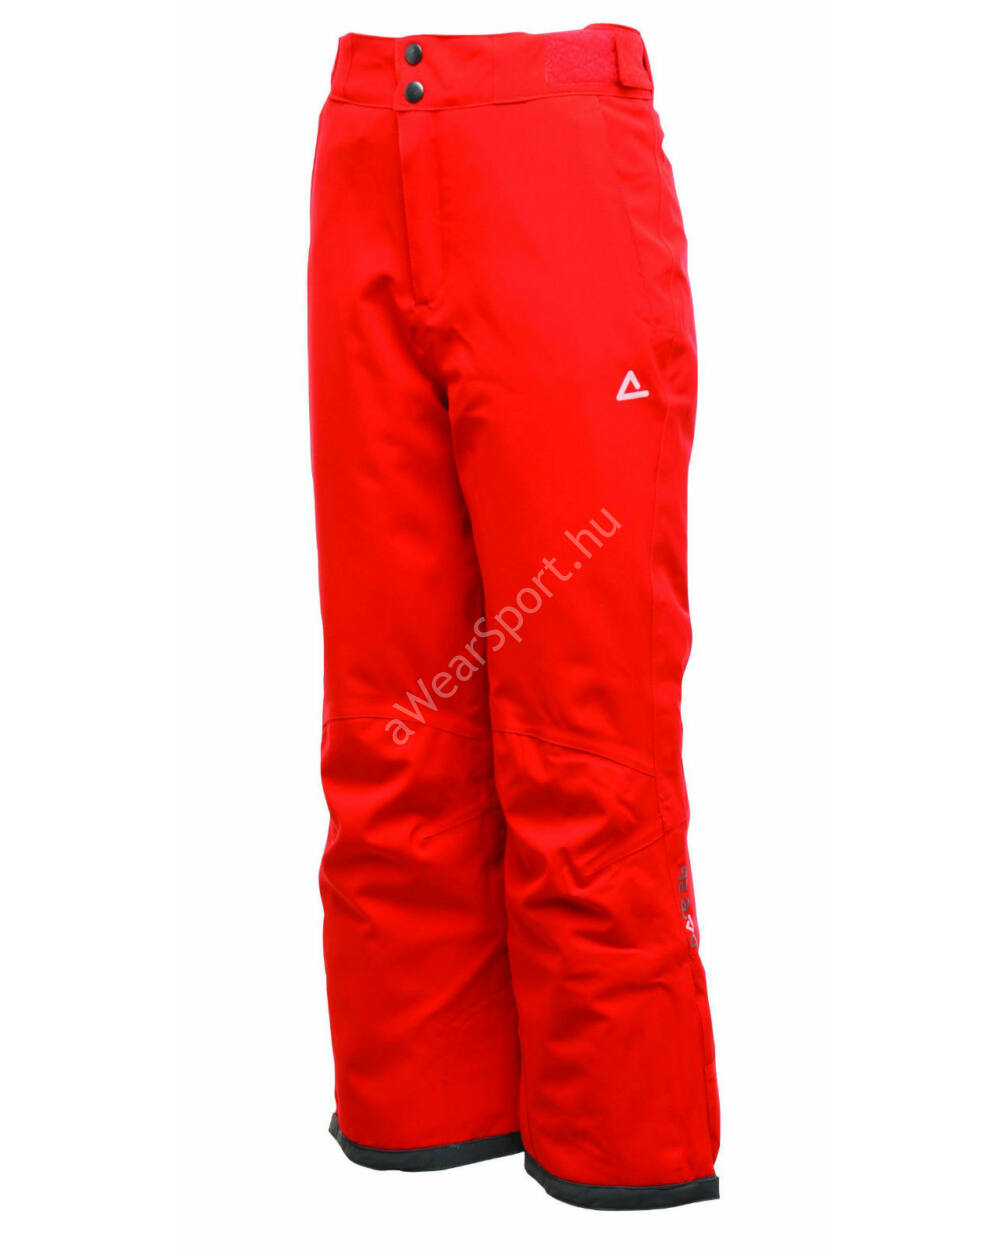 Dare2b Step it Up 10.000mm 4irányú strech gyermek sínadrág, red alert, 128